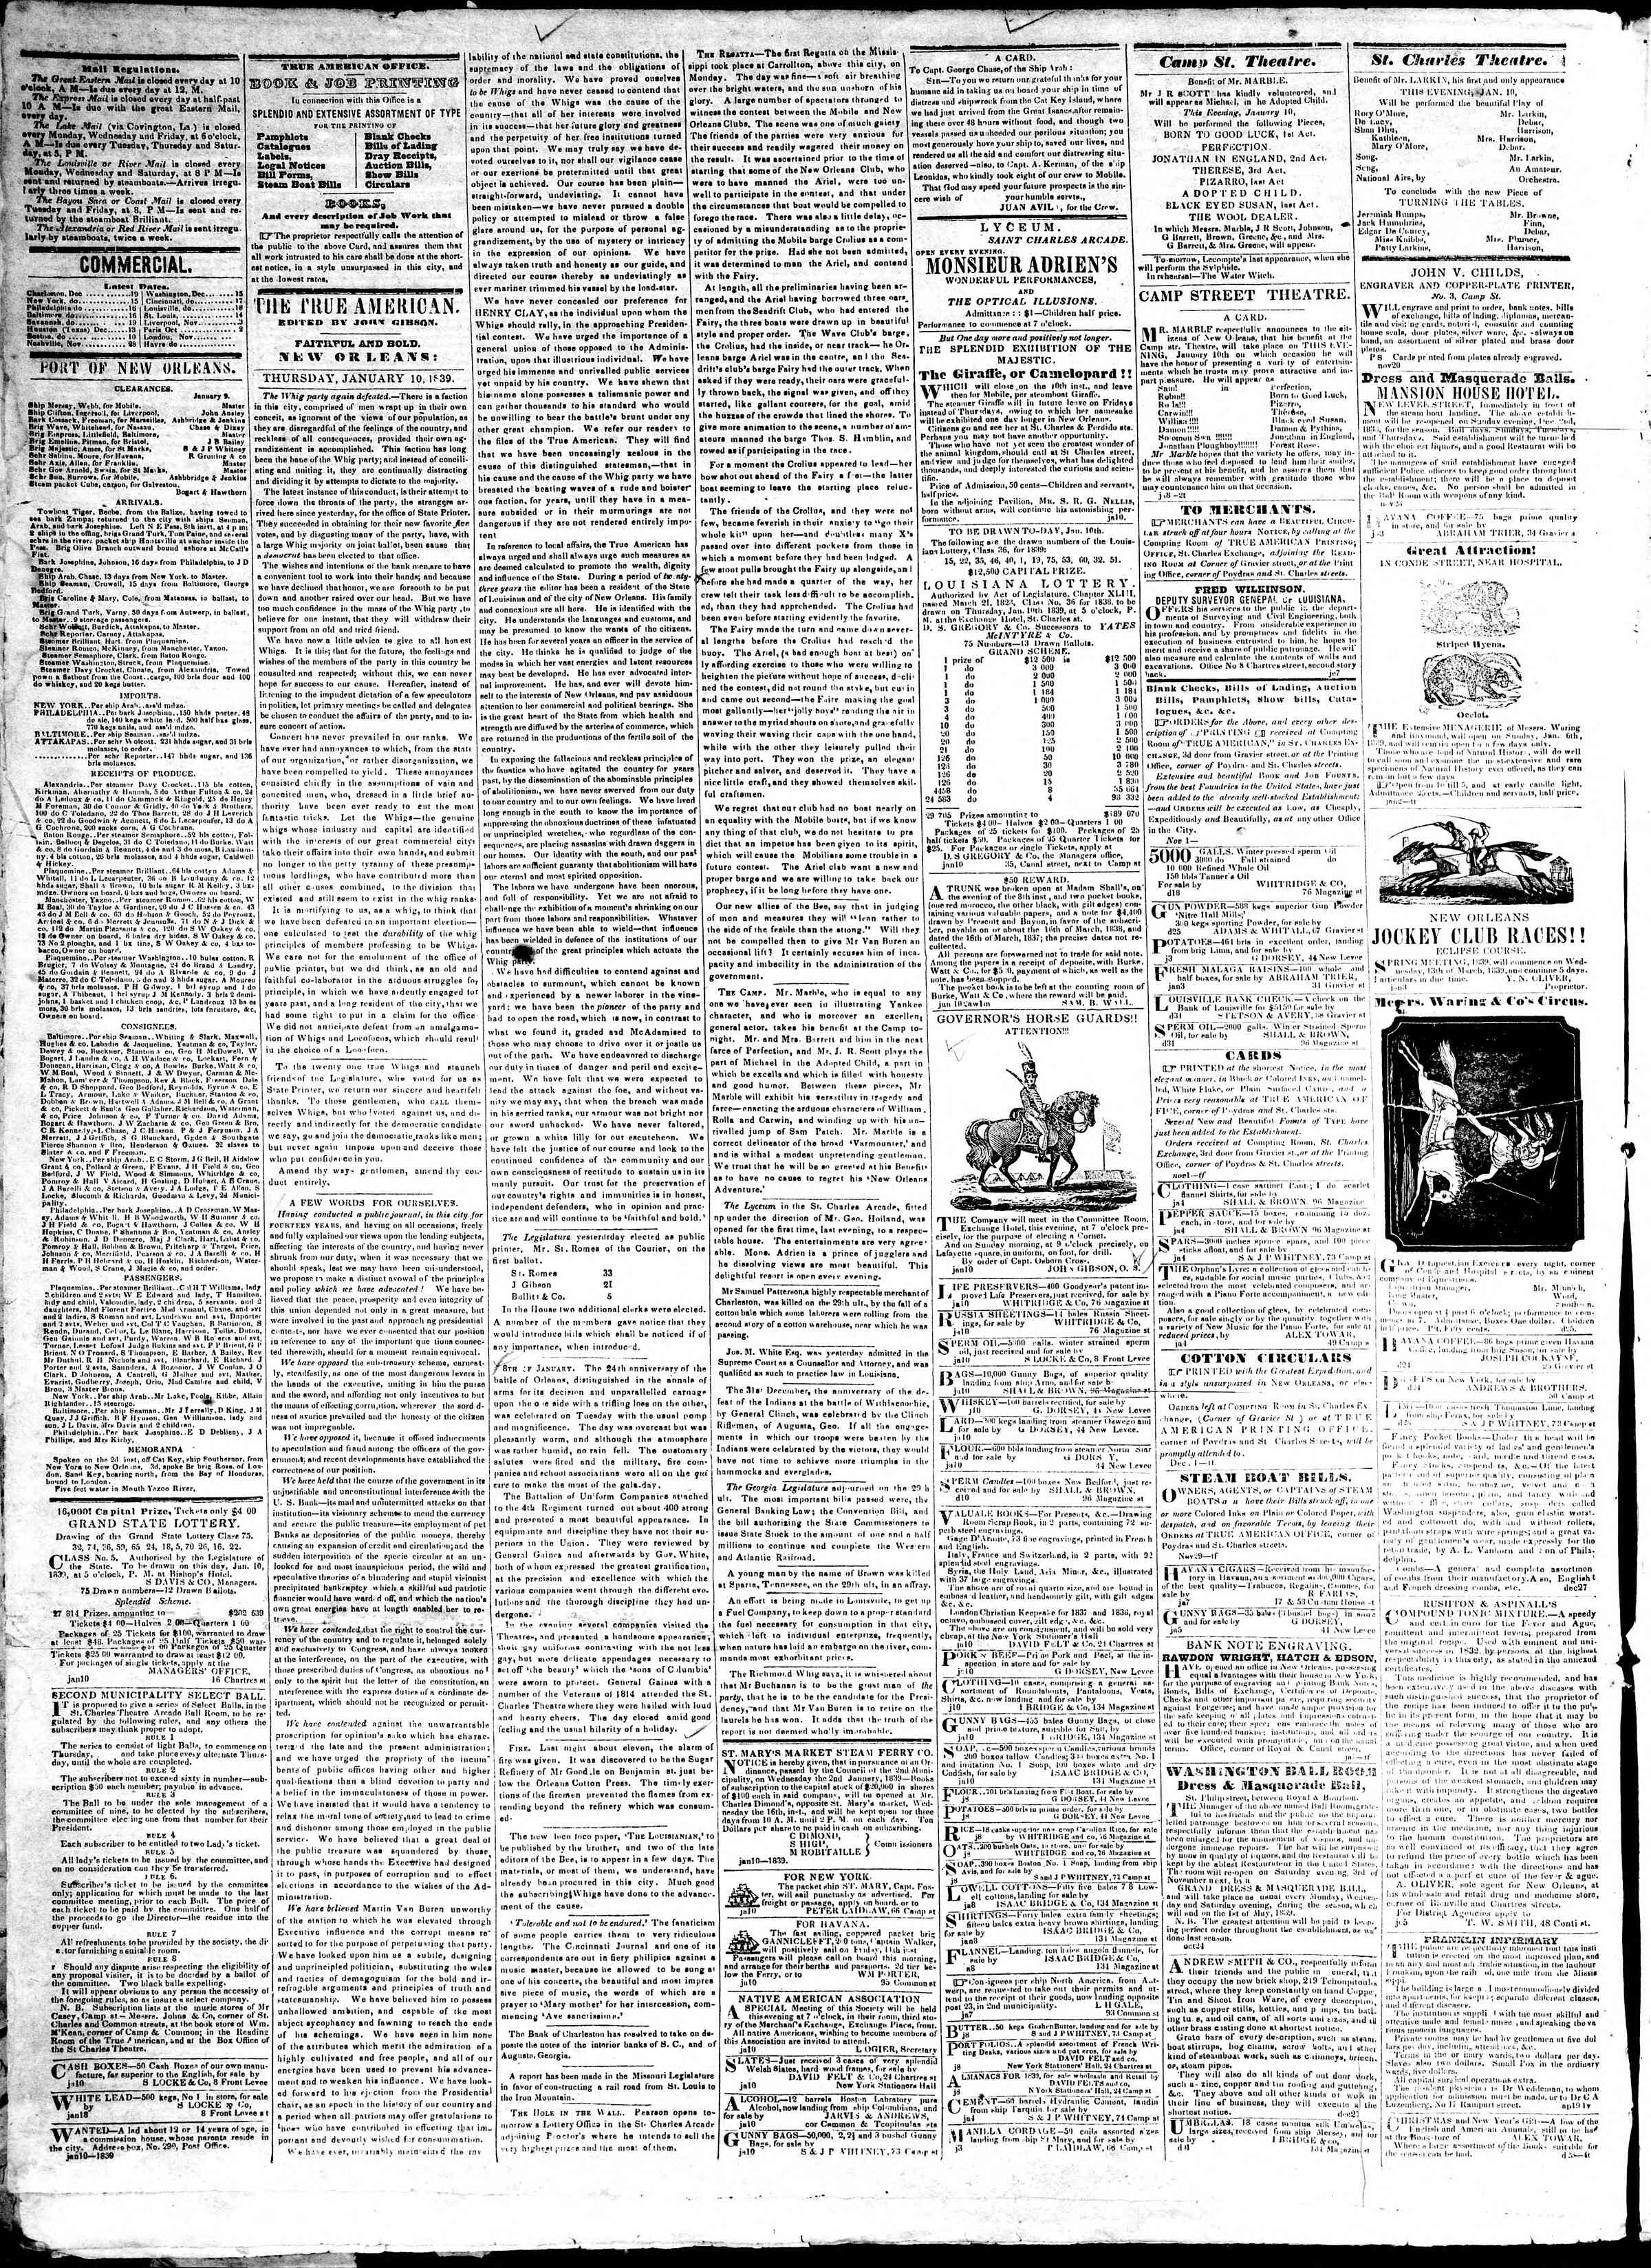 January 10, 1839 Tarihli True American Gazetesi Sayfa 2